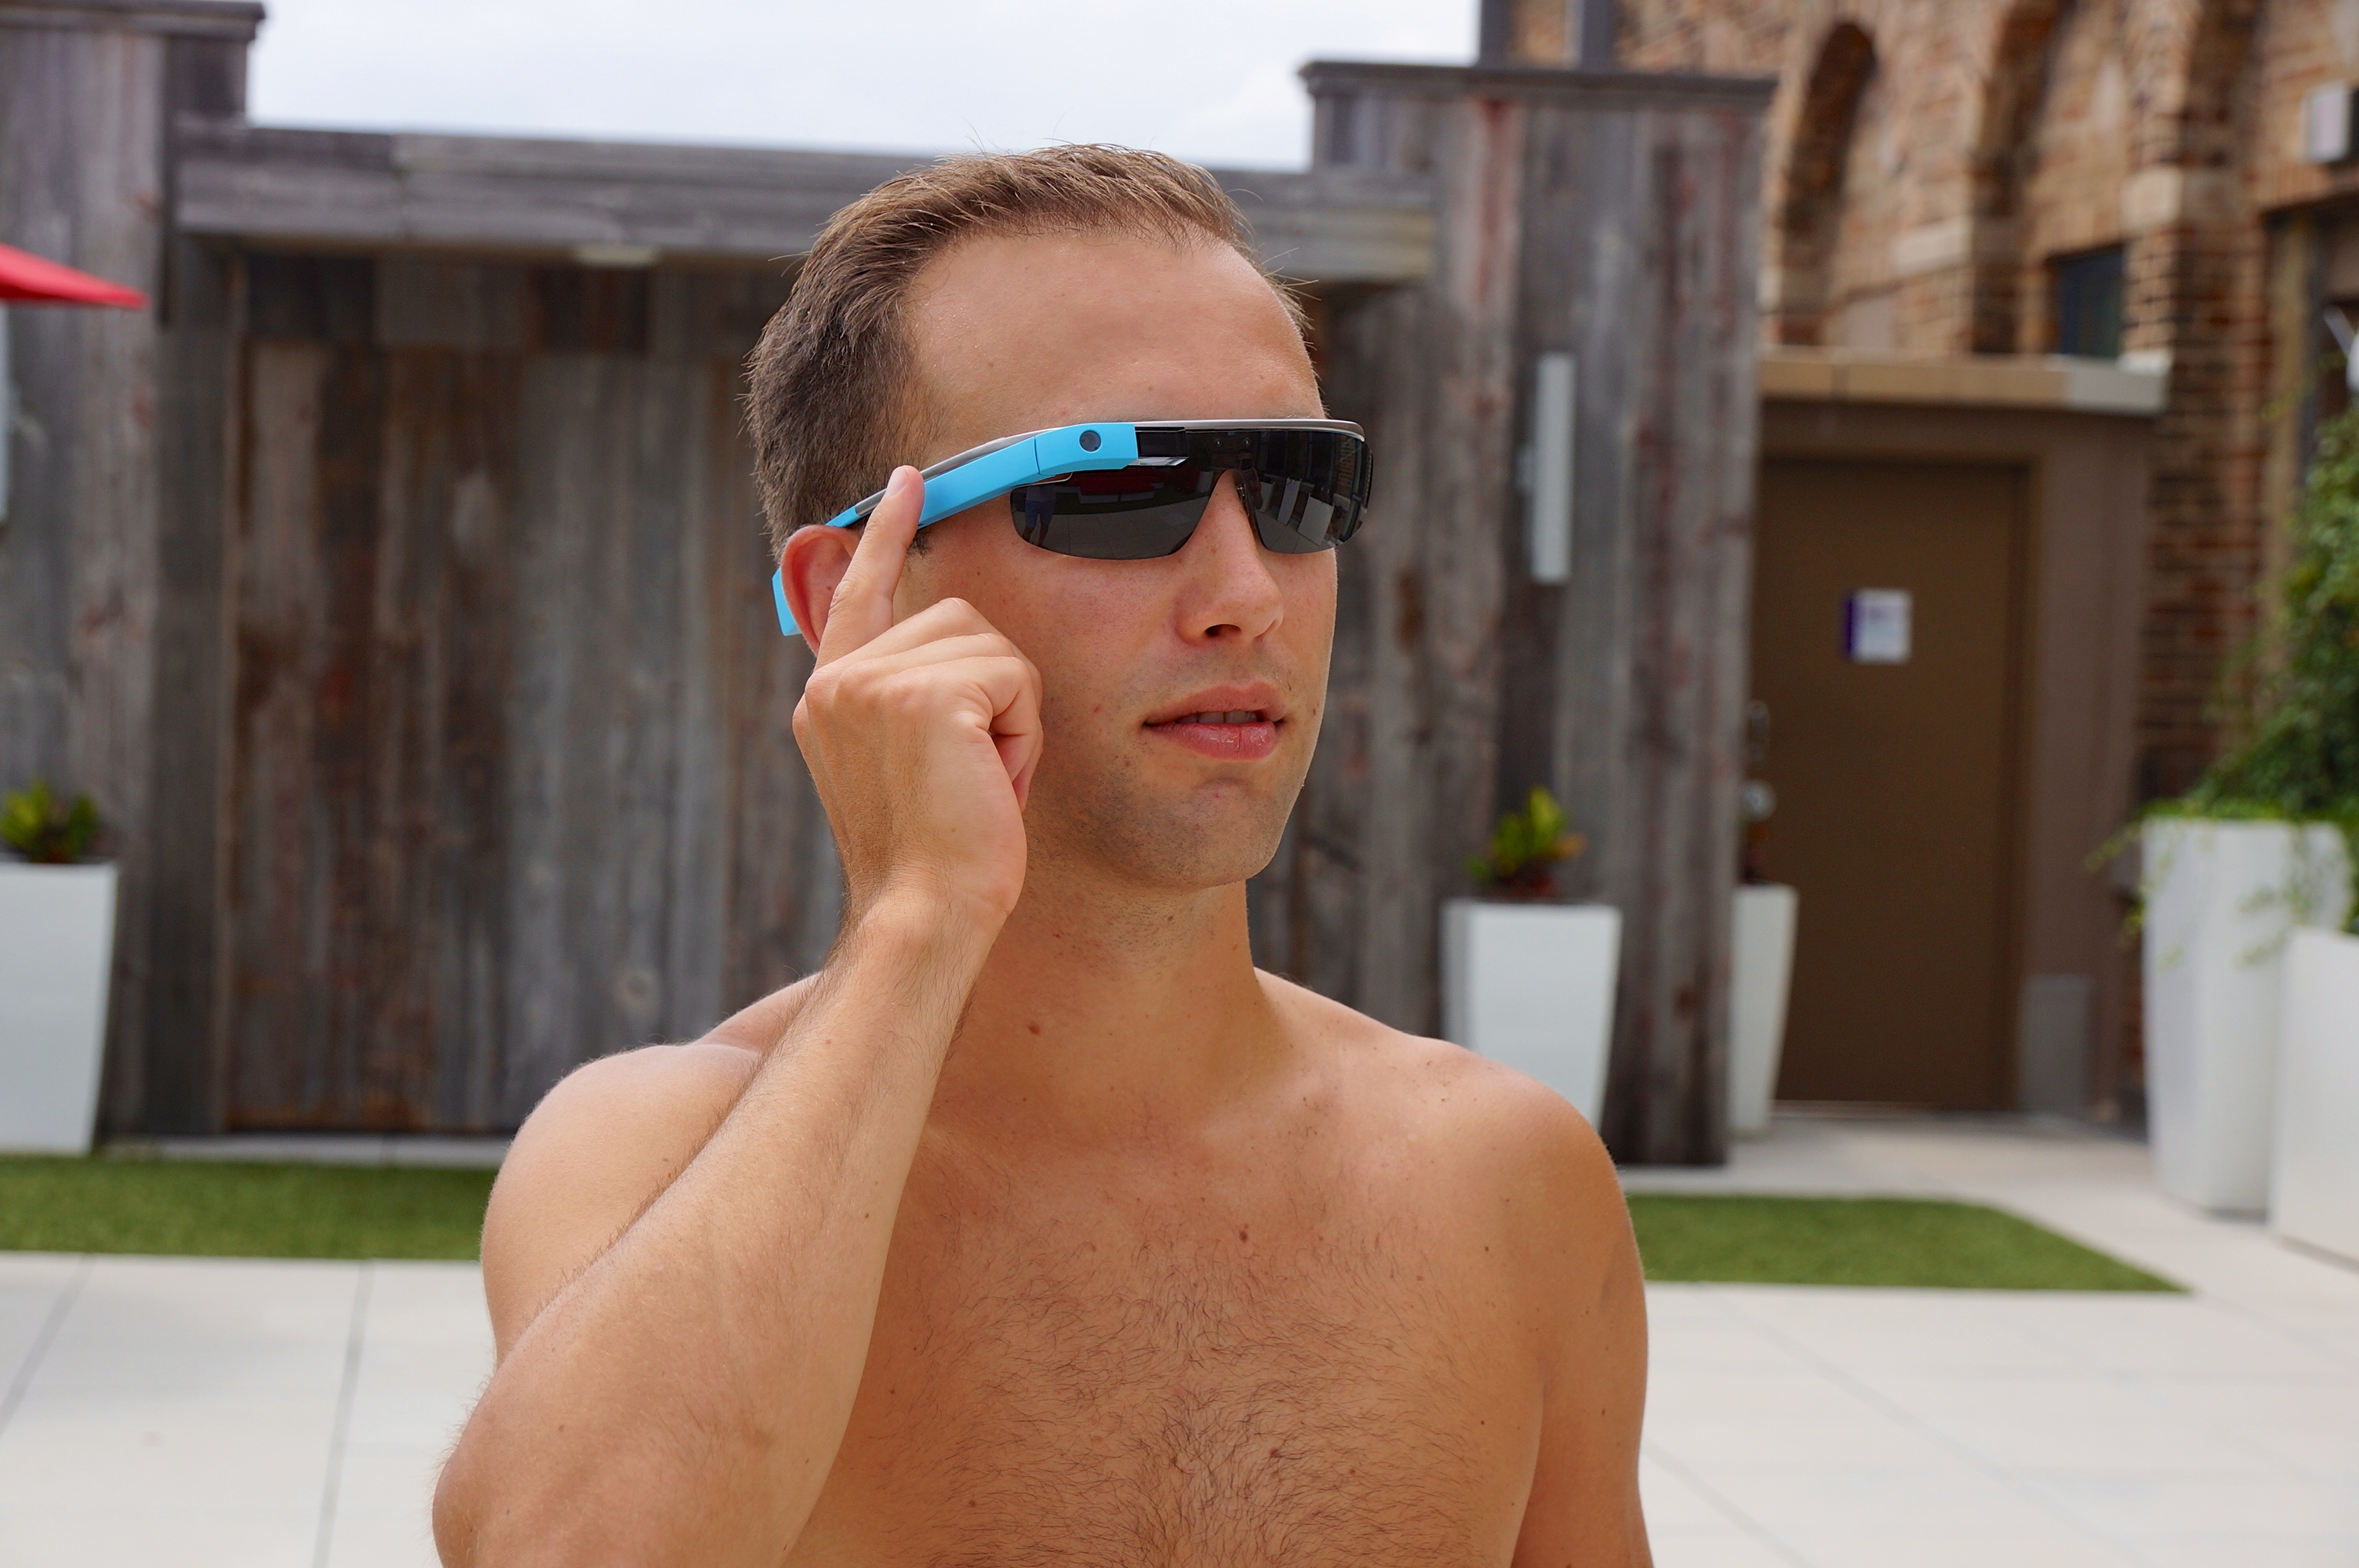 Google Glass Photoshoot 27186